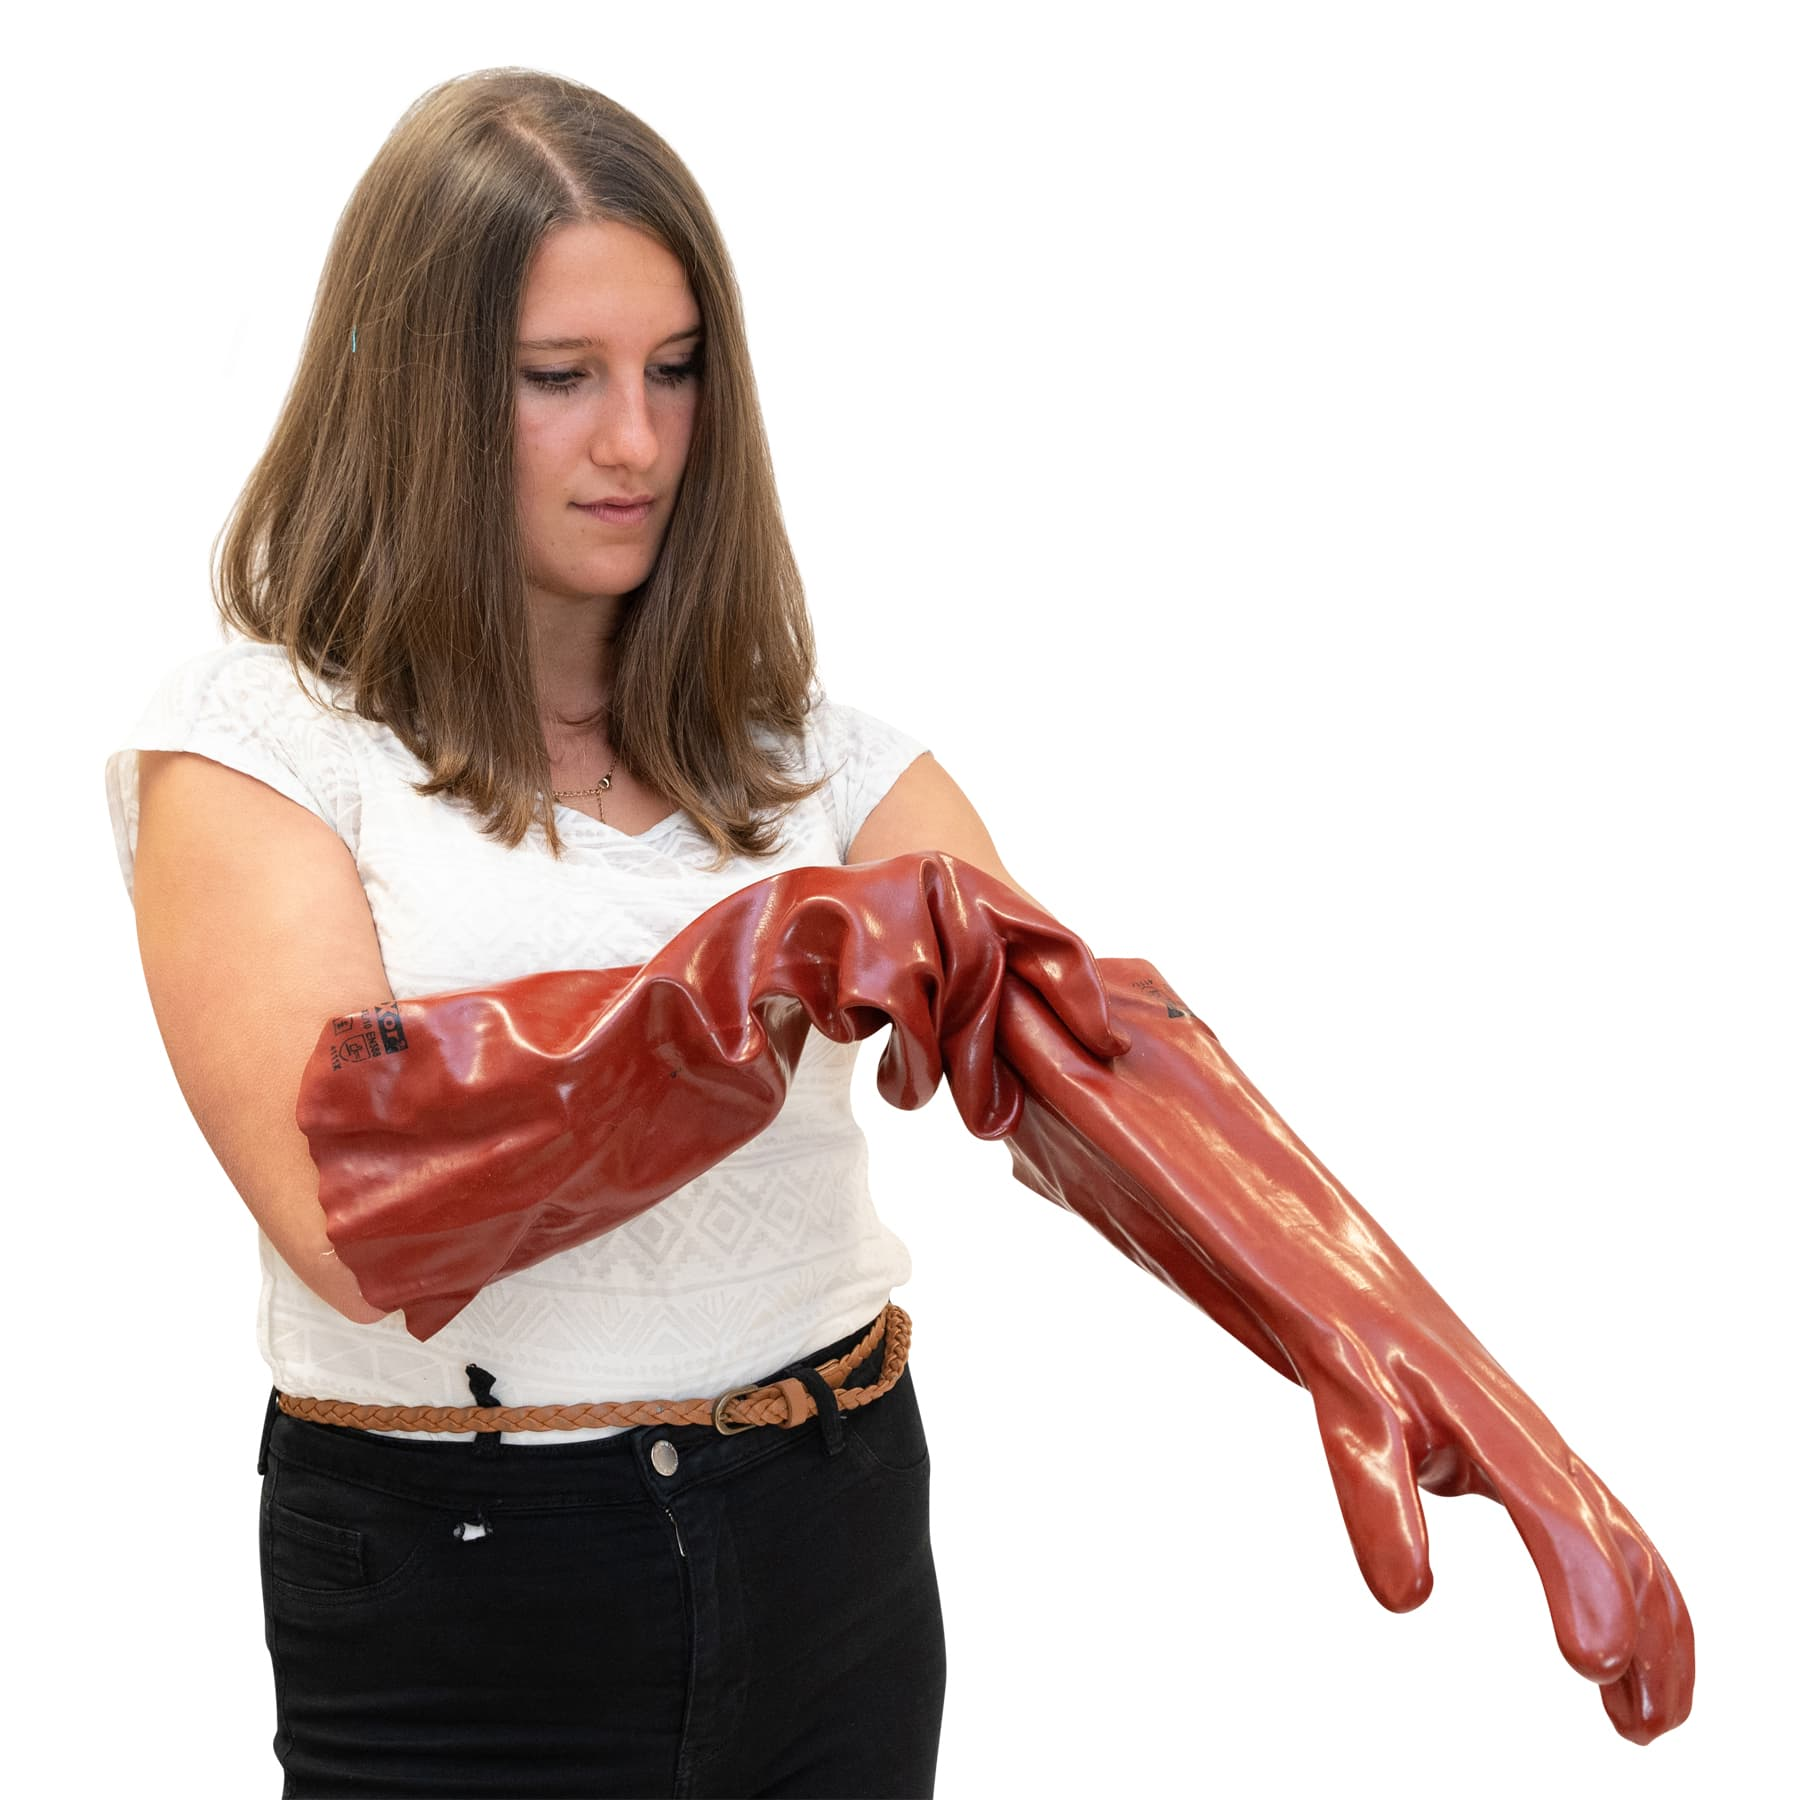 PVC-Handschuhe, rotbraun 45 cm lang 1 Paar Art. 2173